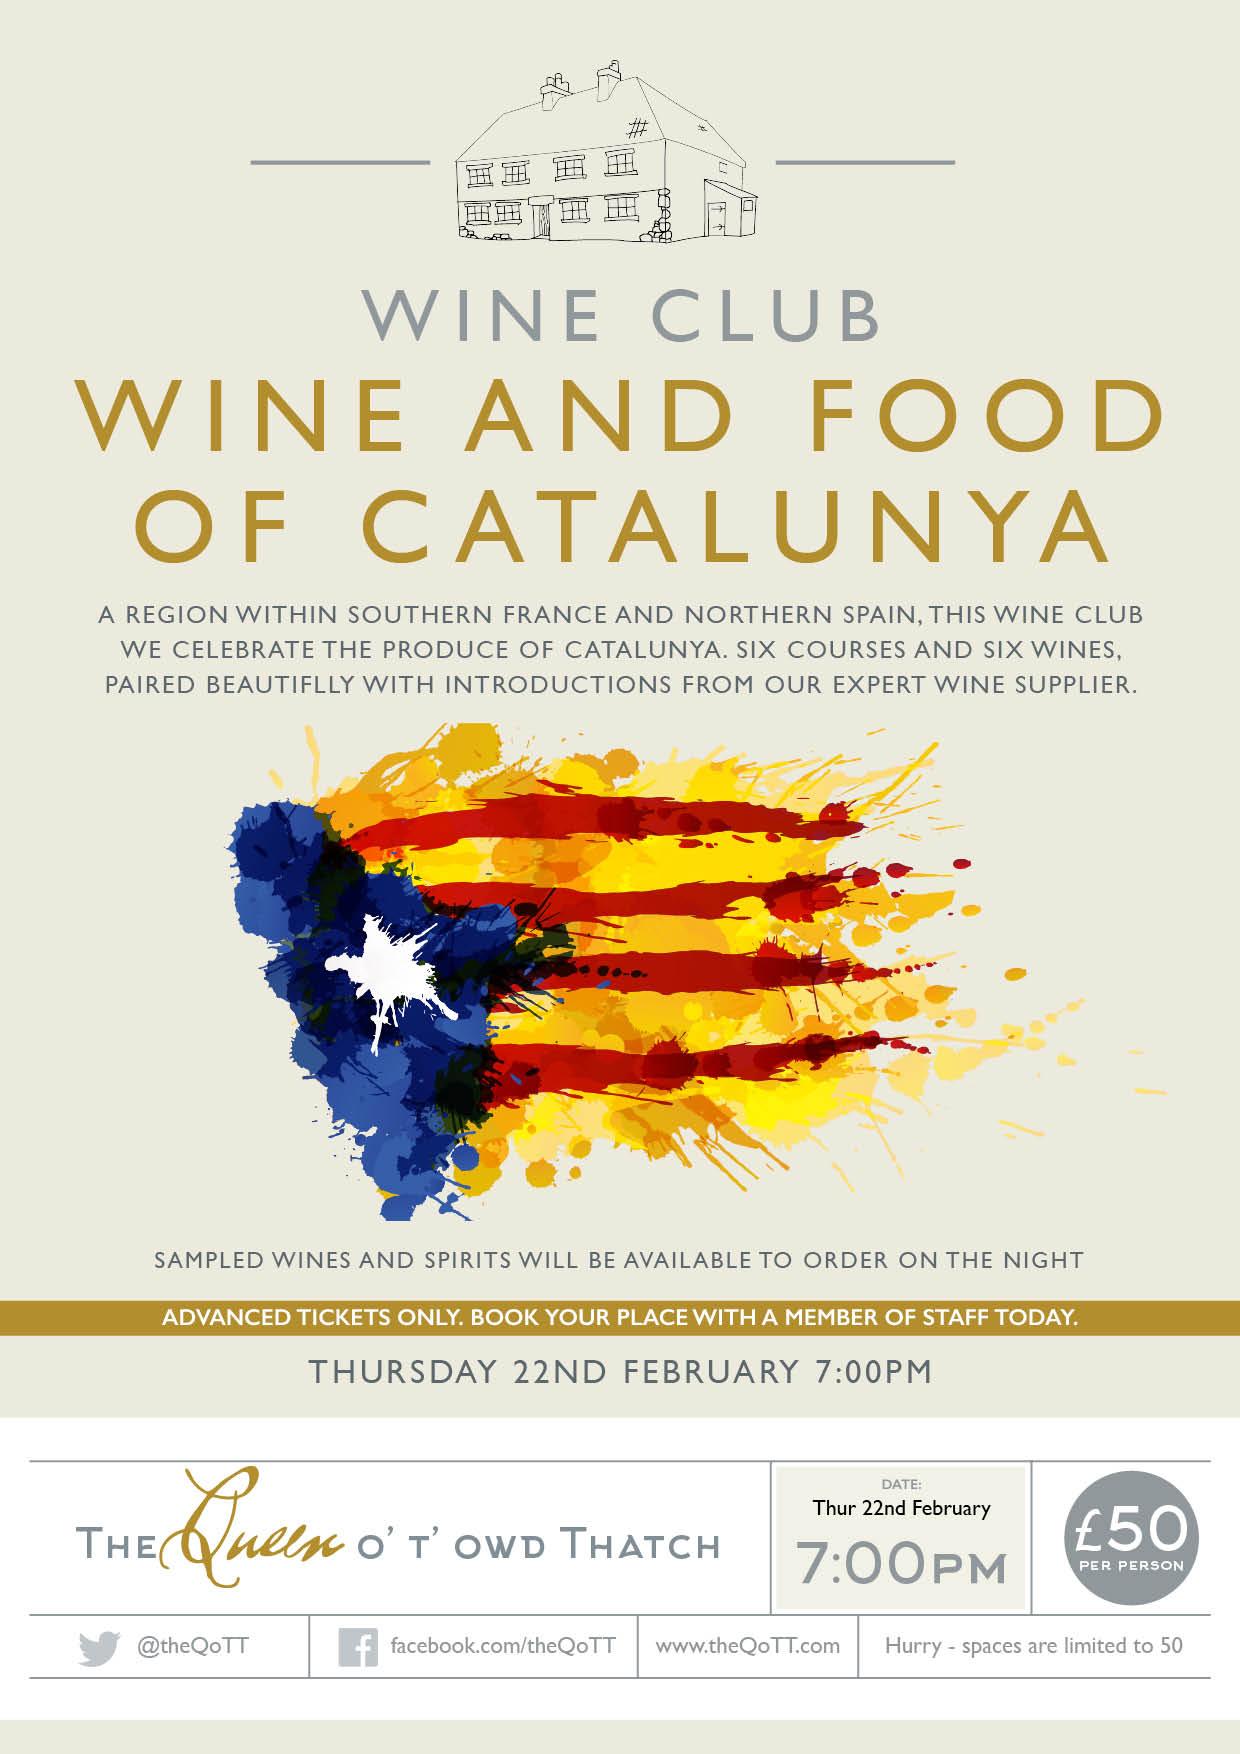 22nd_feb_wine_club_catalunya.jpg